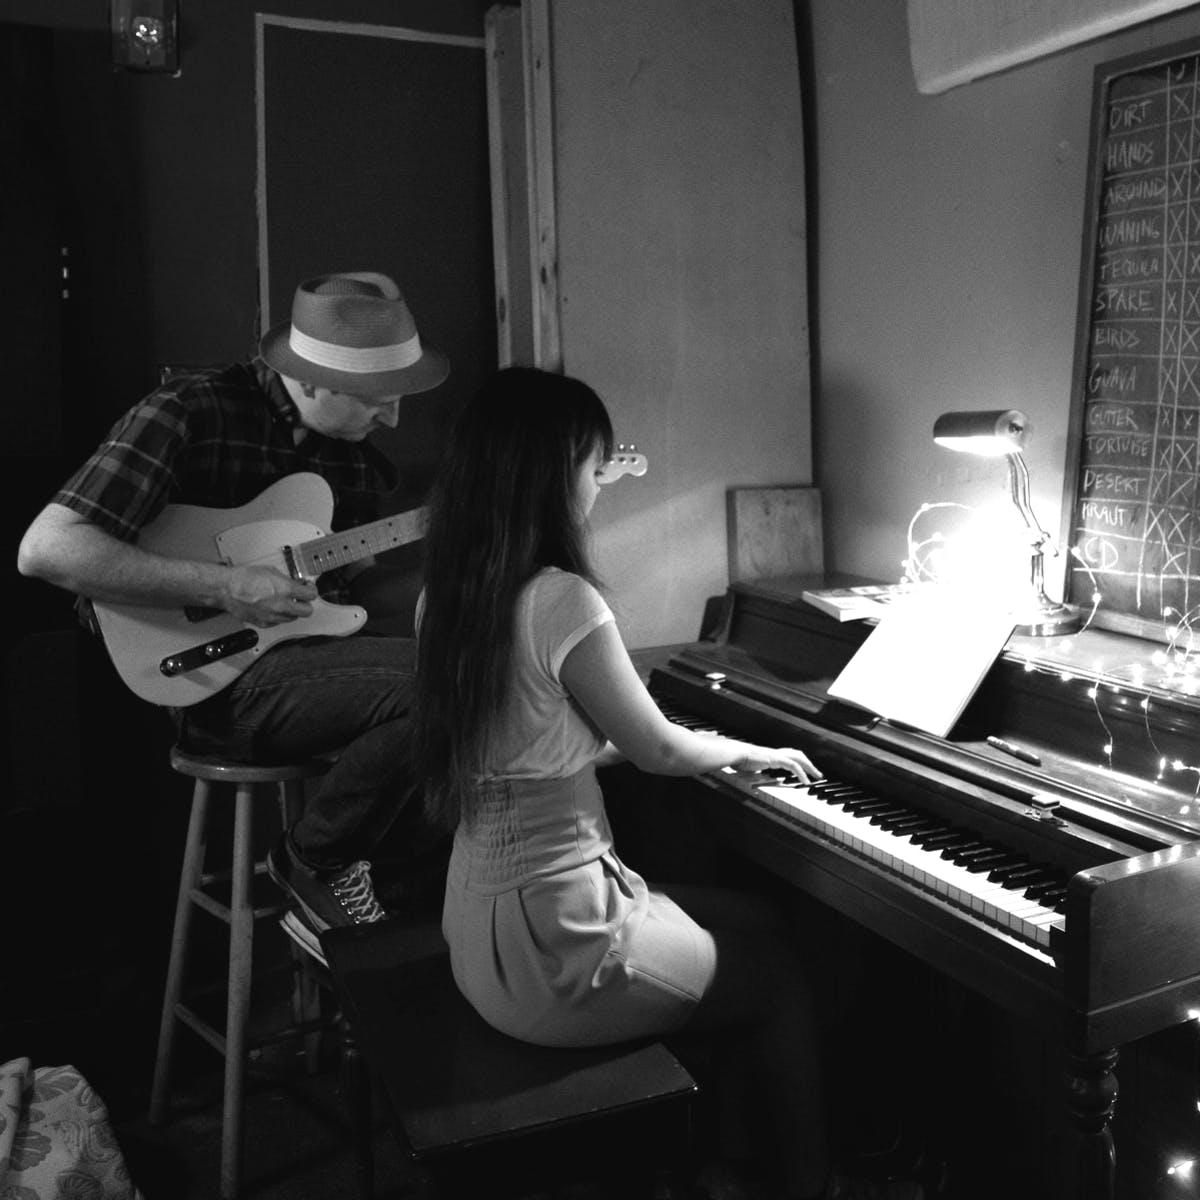 Songwriting: Writing the Lyrics